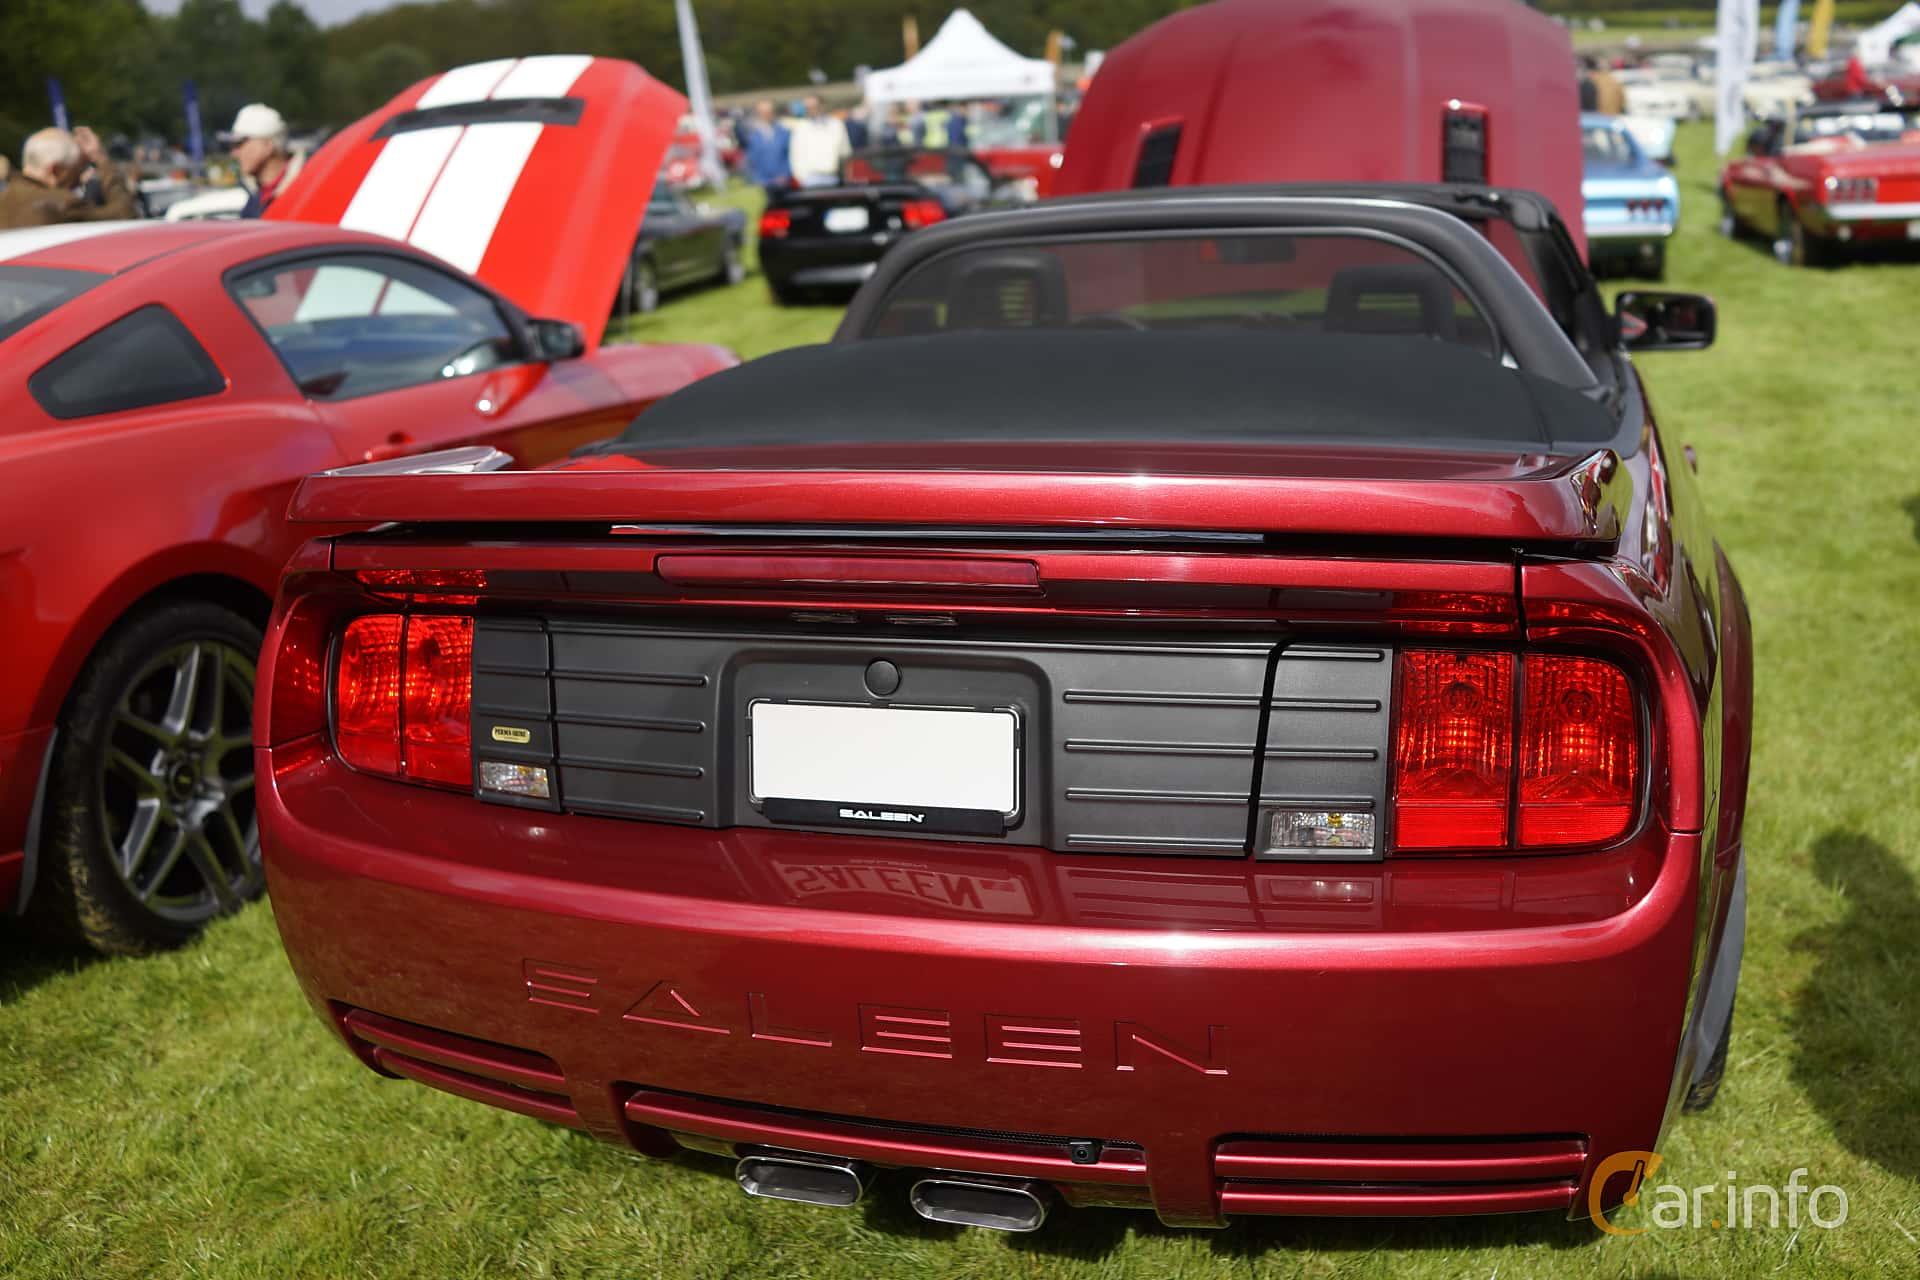 Tagen P Tjolholm Classic Motor 2015 Ford Mustang Convertible Gt 46 V8 Manual 304hp 2006 At